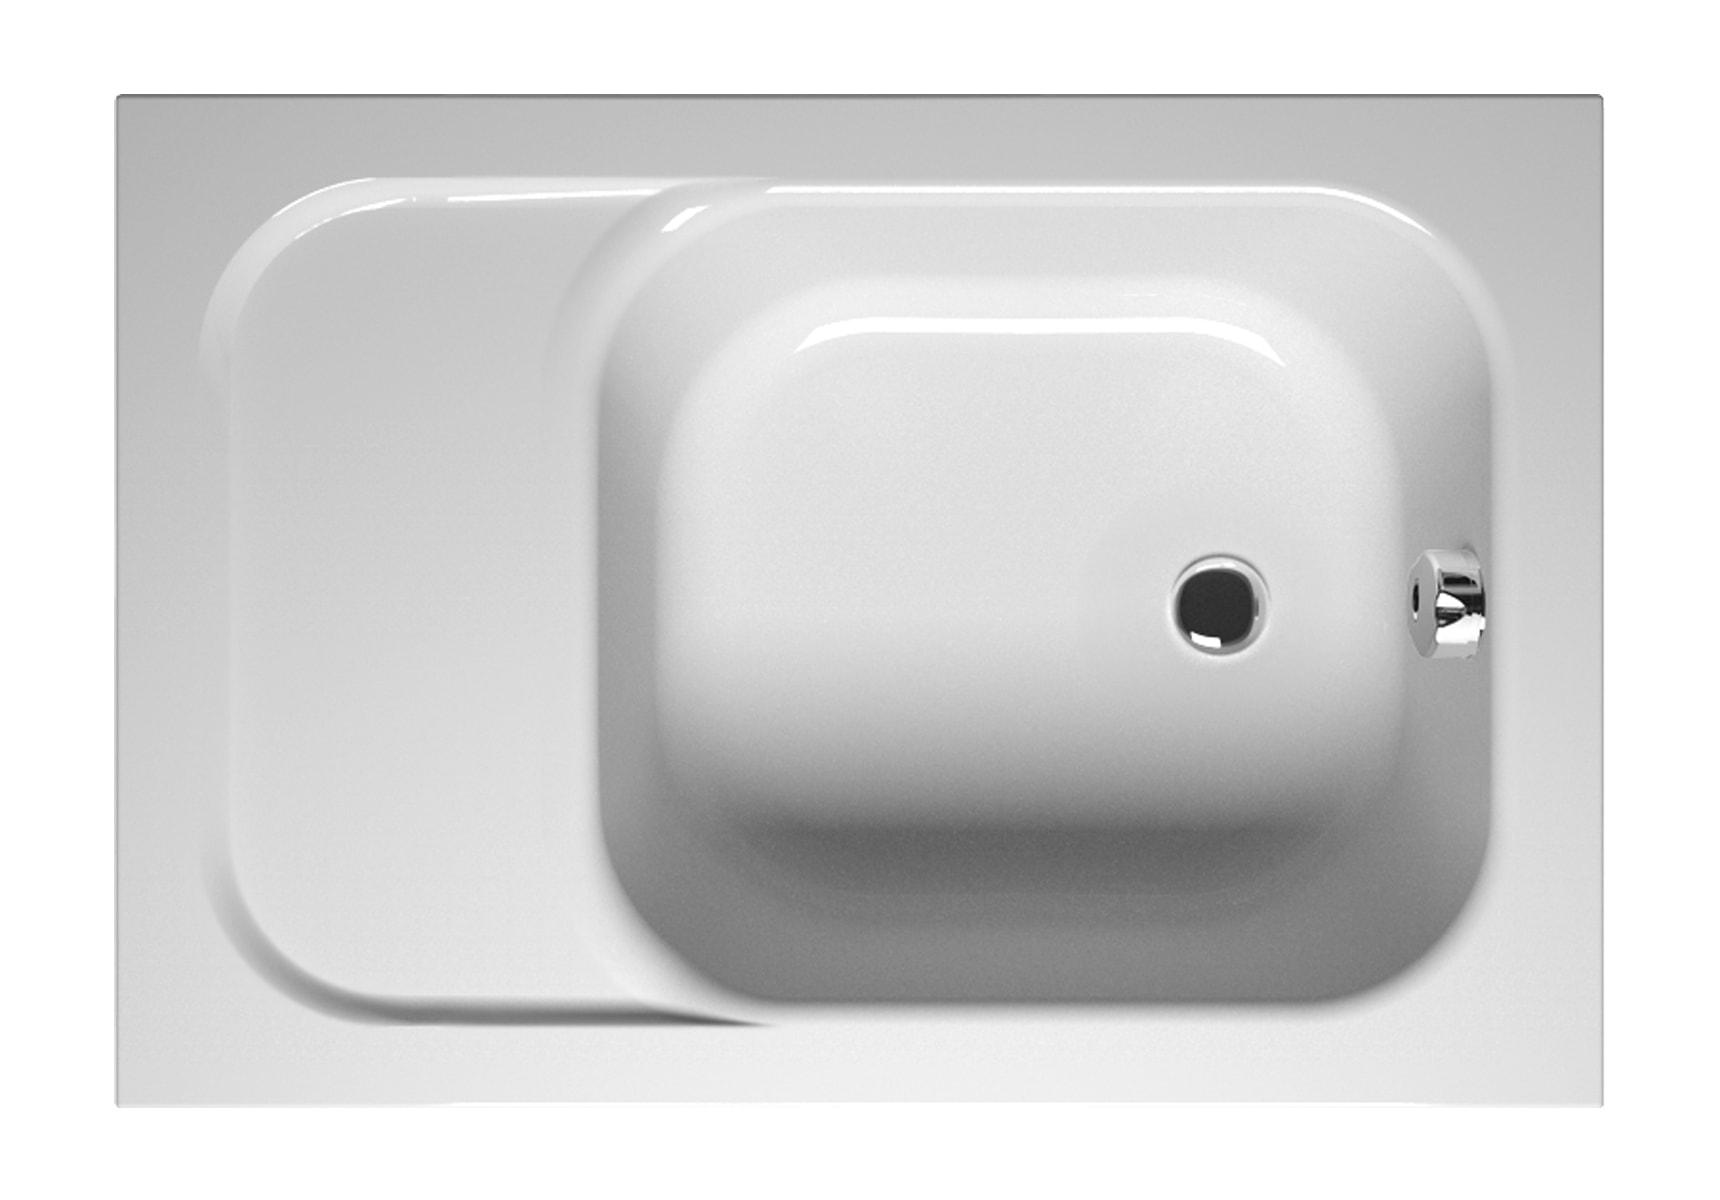 Balance 110x75cm Rectangular with Seat Bathtub